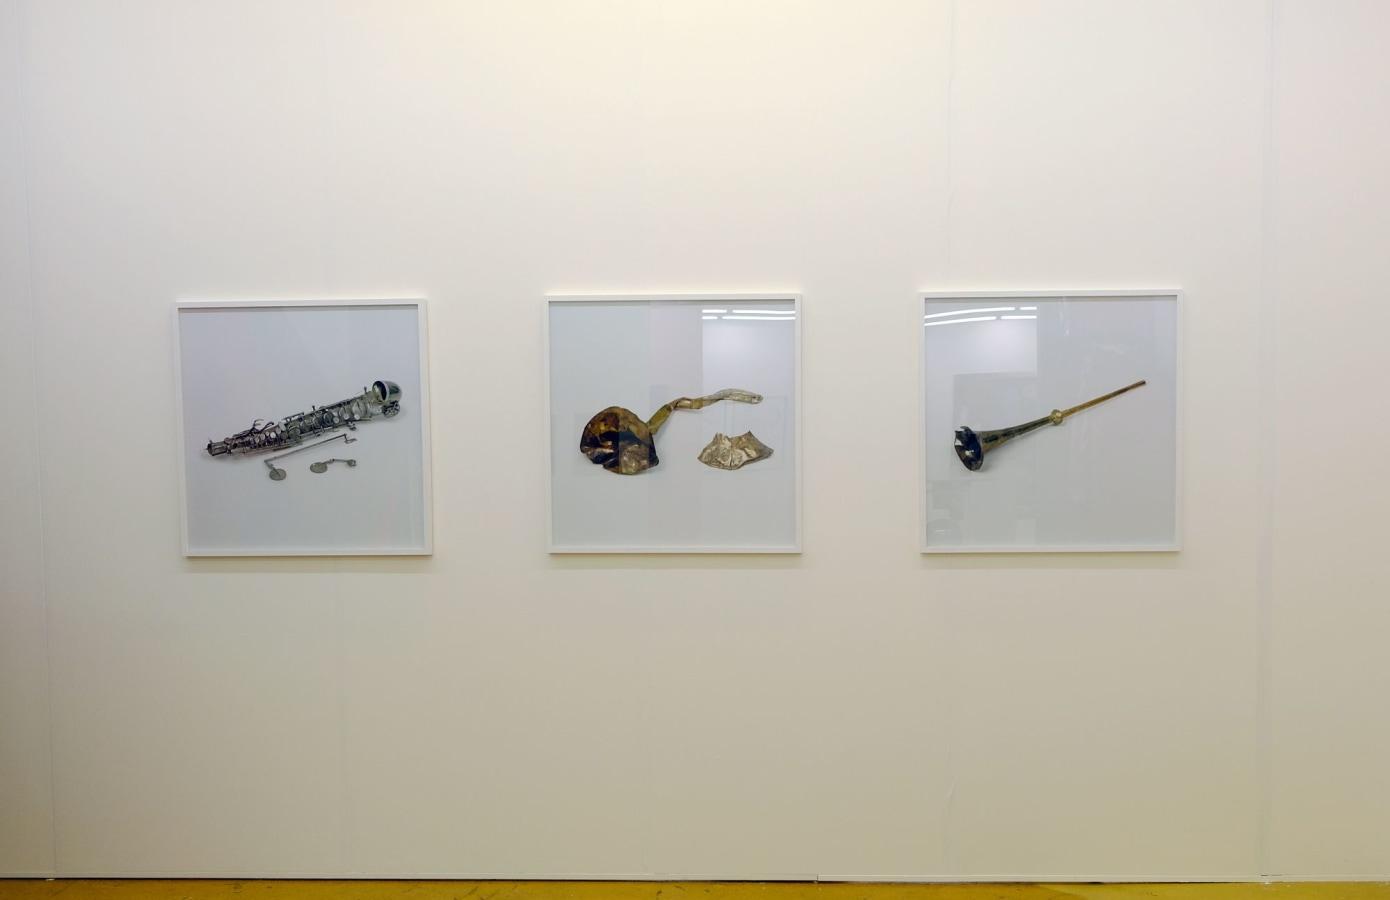 Art Rotterdam 2019, Lara Almarcegui, Otto Berchem, Pauline Curnier Jardin, Klaas Kloosterboer, Susan Philipsz,